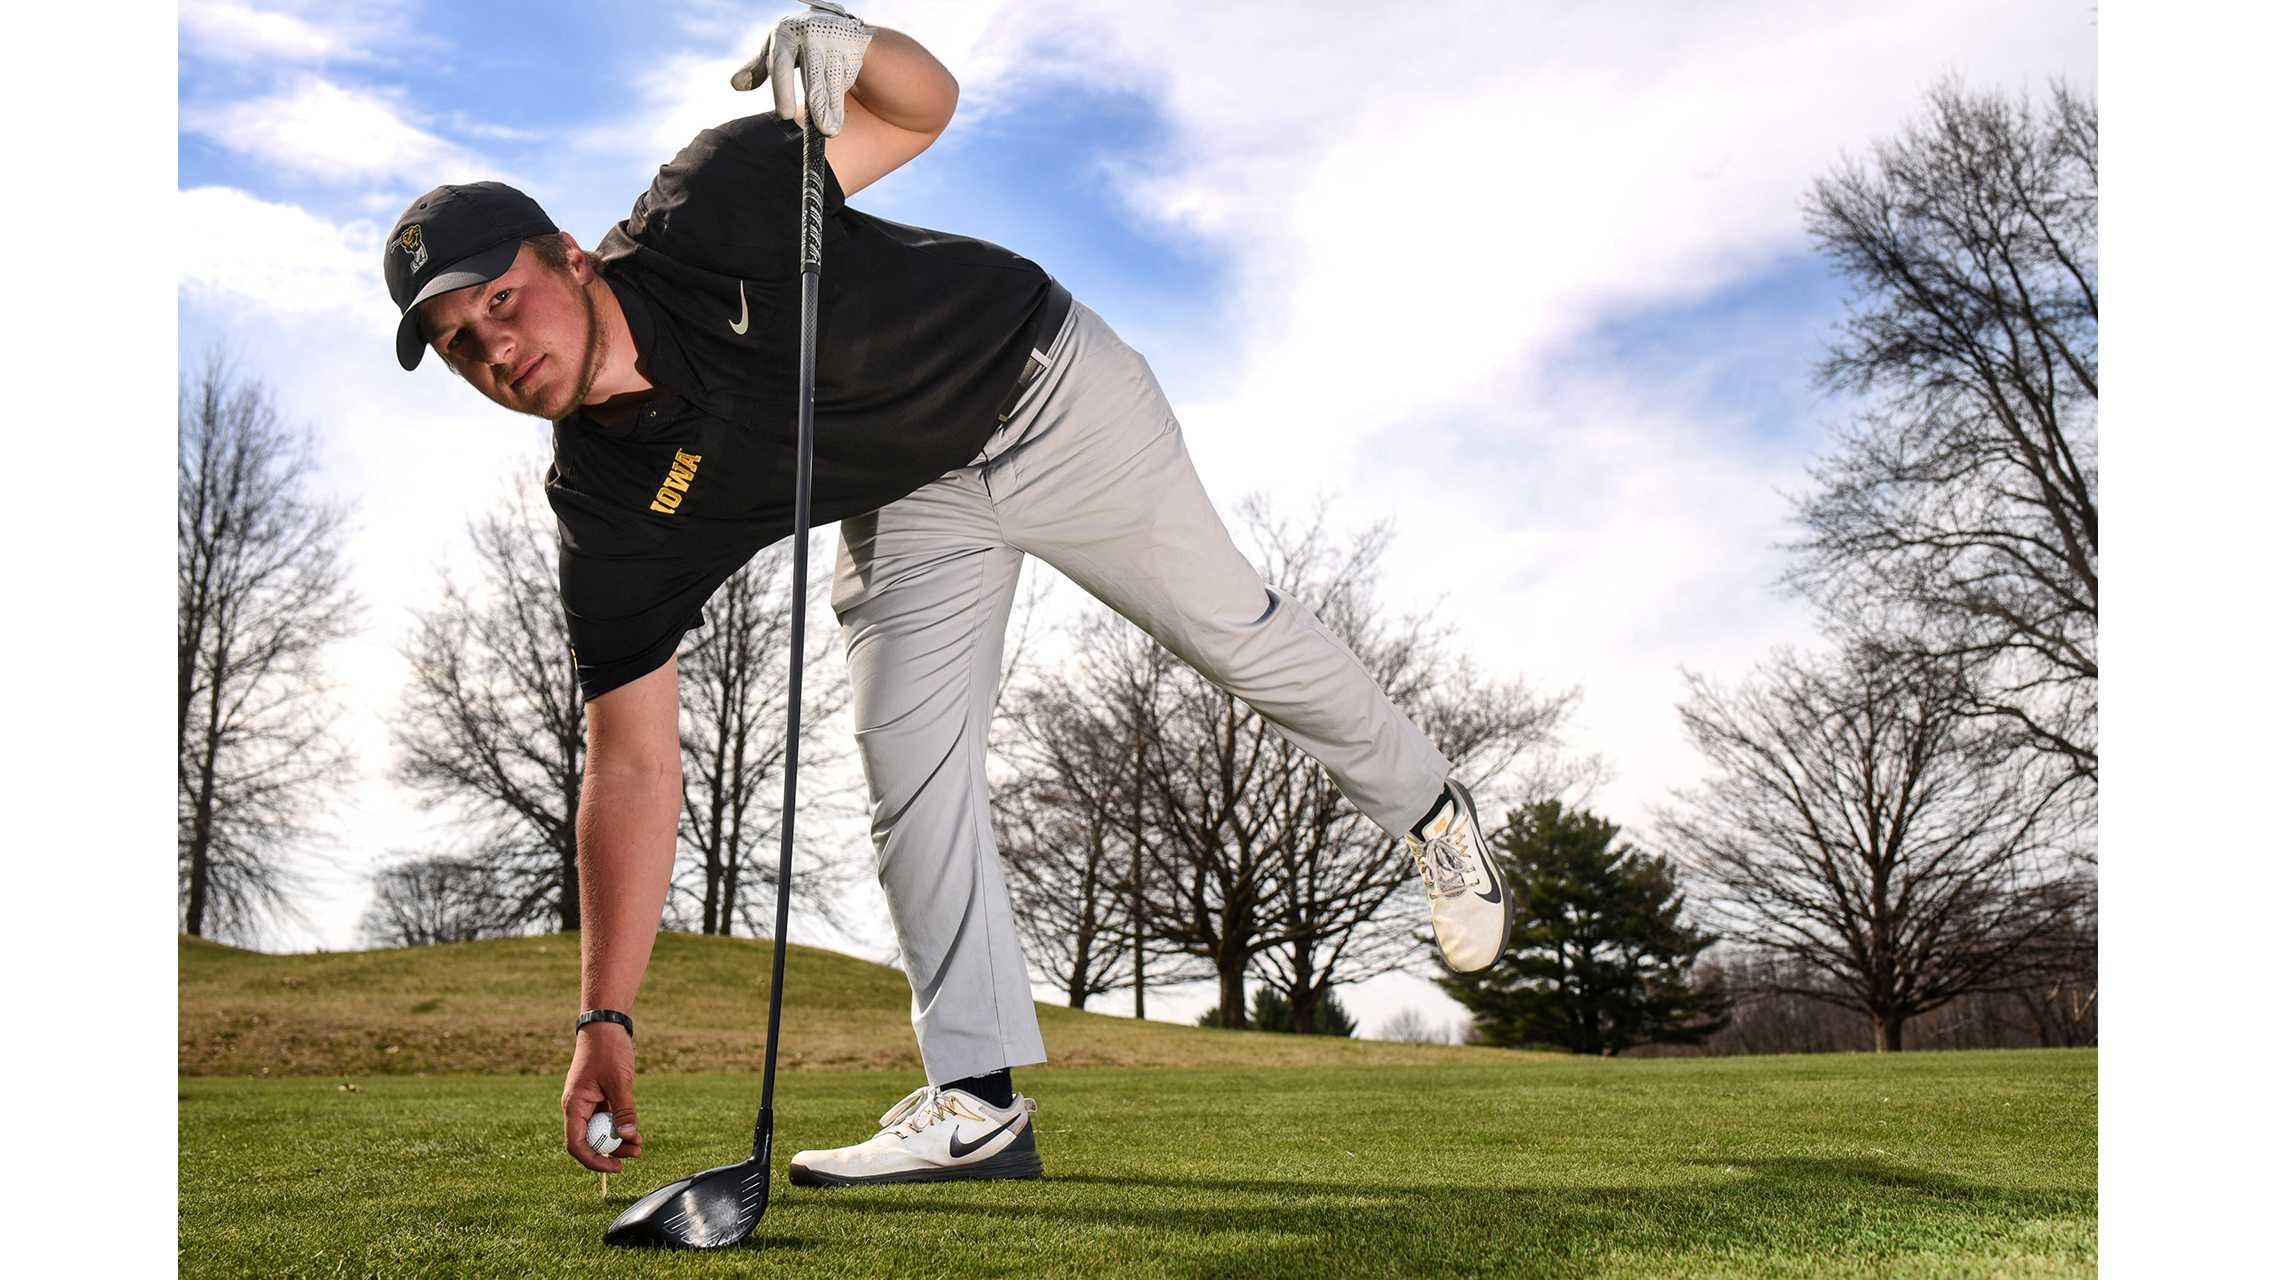 Golfer Schaake takes on regional